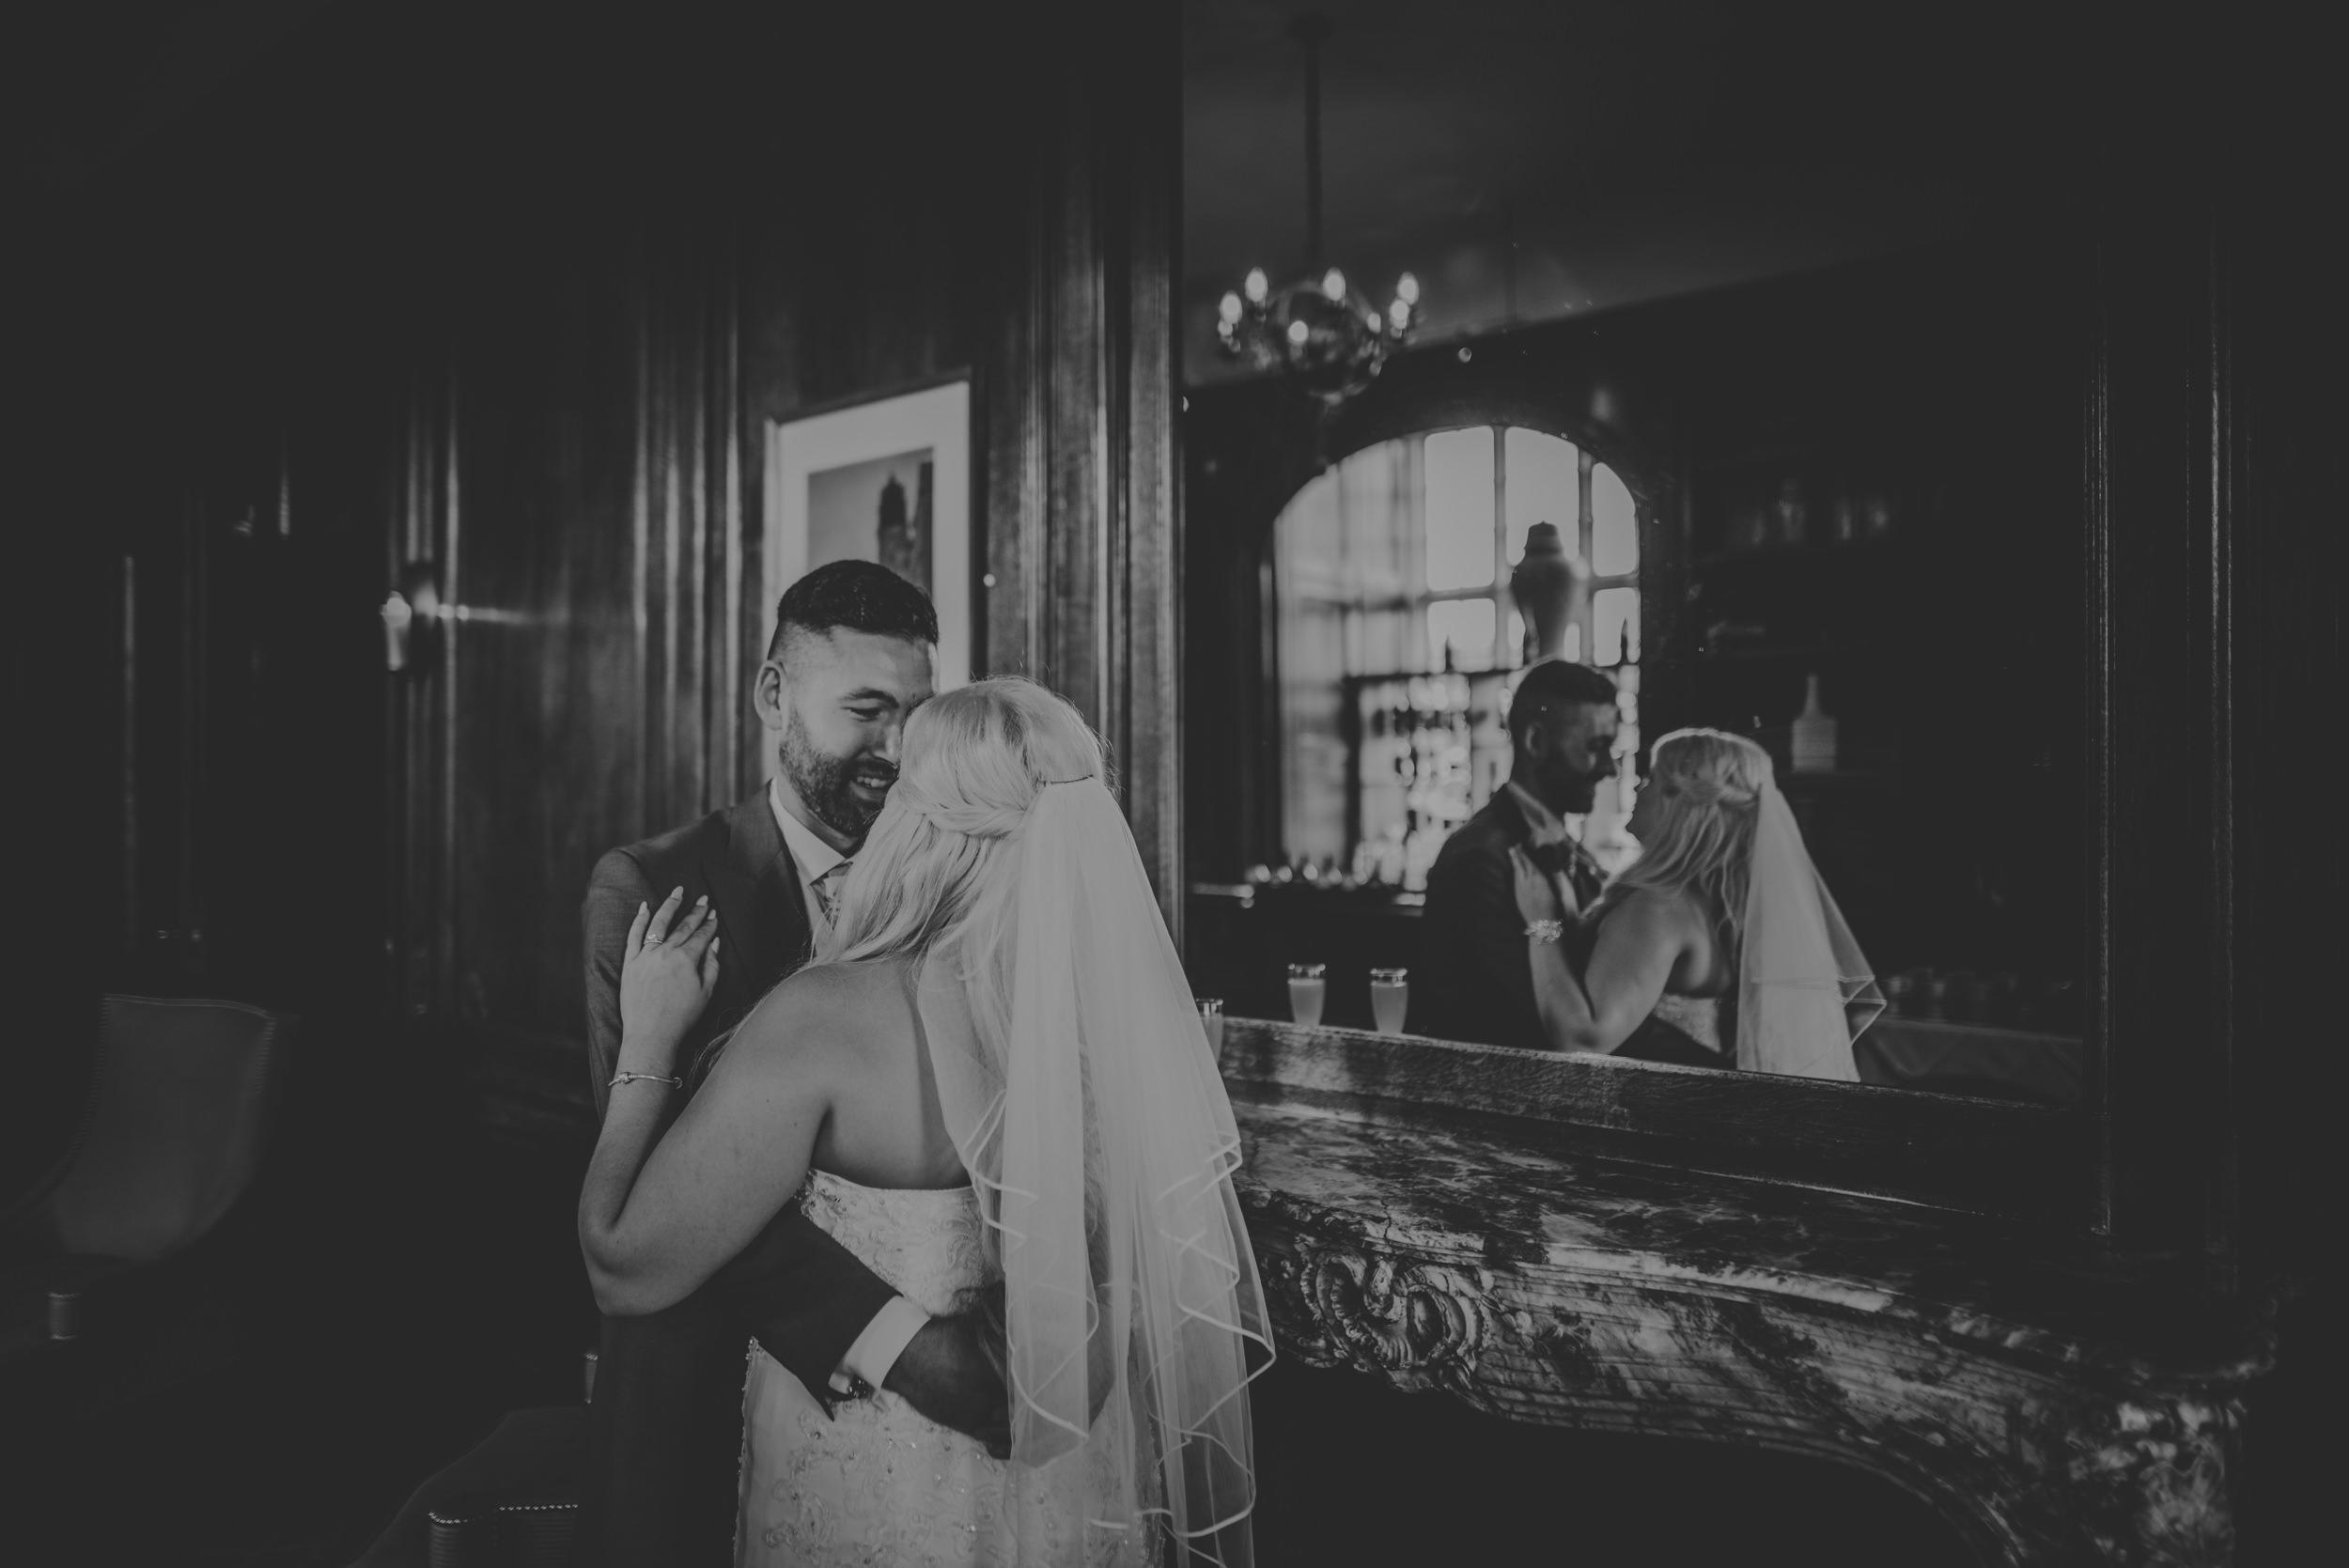 Rachel-and-James-Wedding-Horsley-Towers-State-Manu-Mendoza-Wedding-Photography-299.jpg